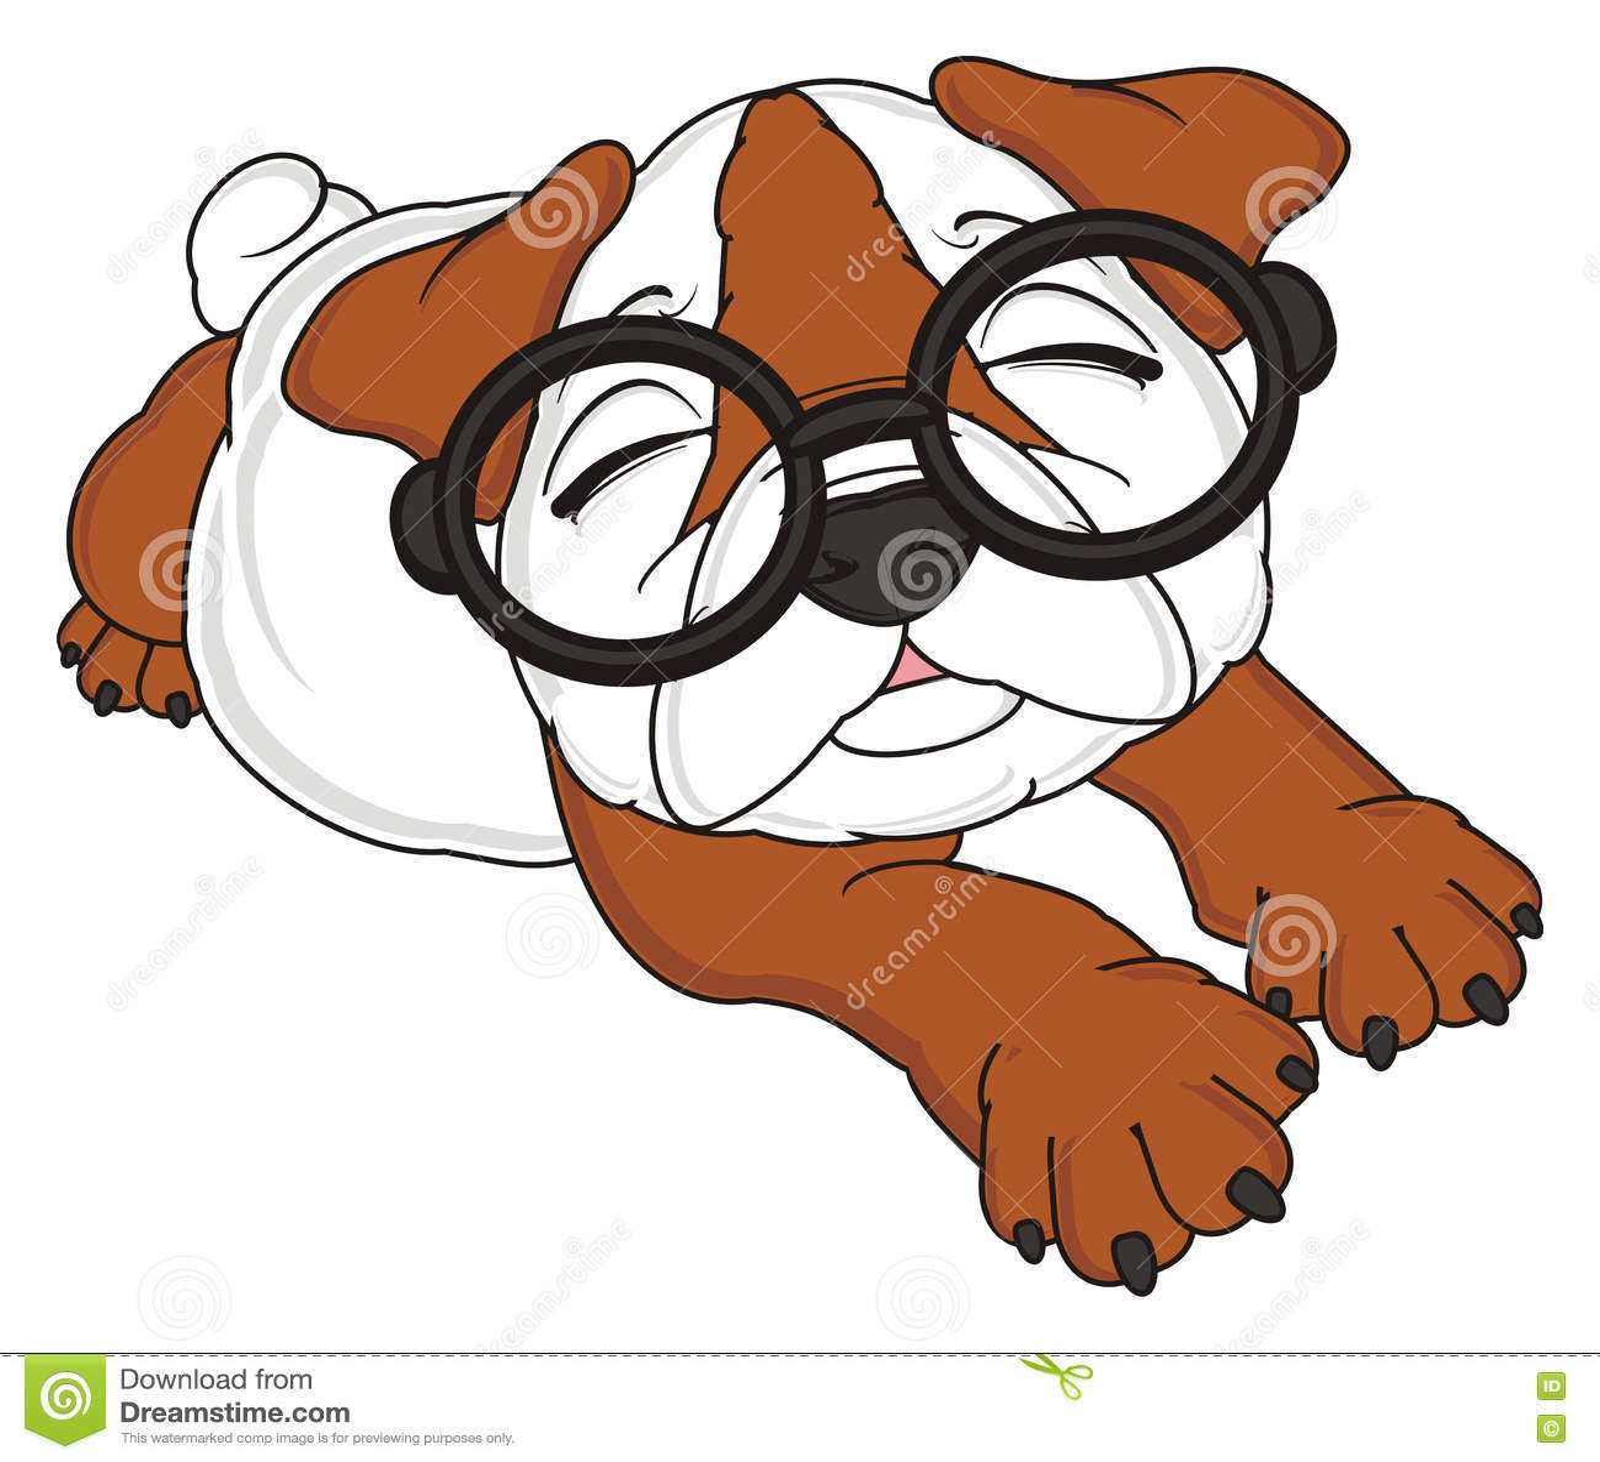 Sleeping Bulldog In Glasses Stock Illustration Illustration Of